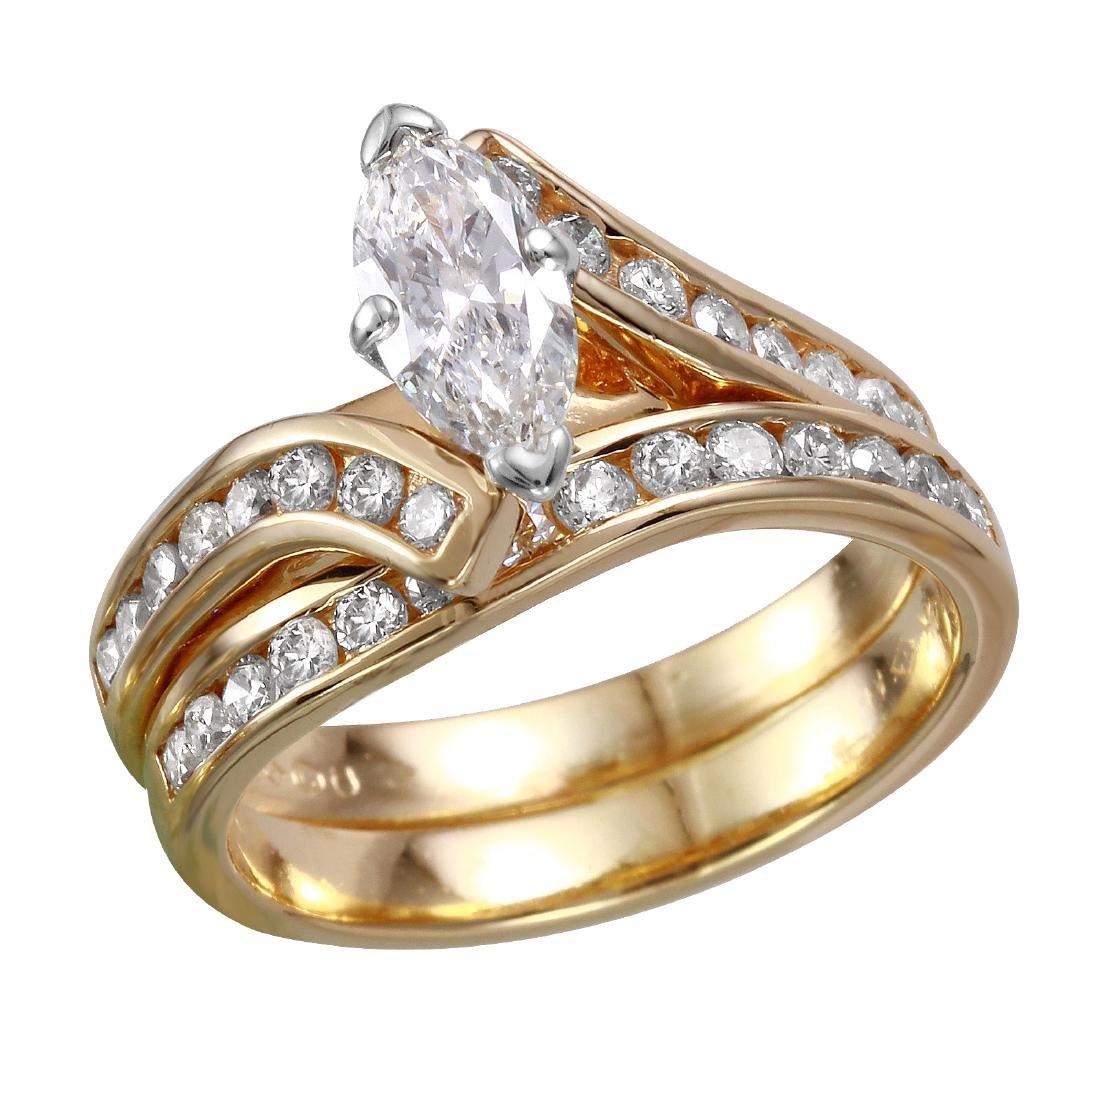 14KT Yellow Gold Diamond Wedding Ring